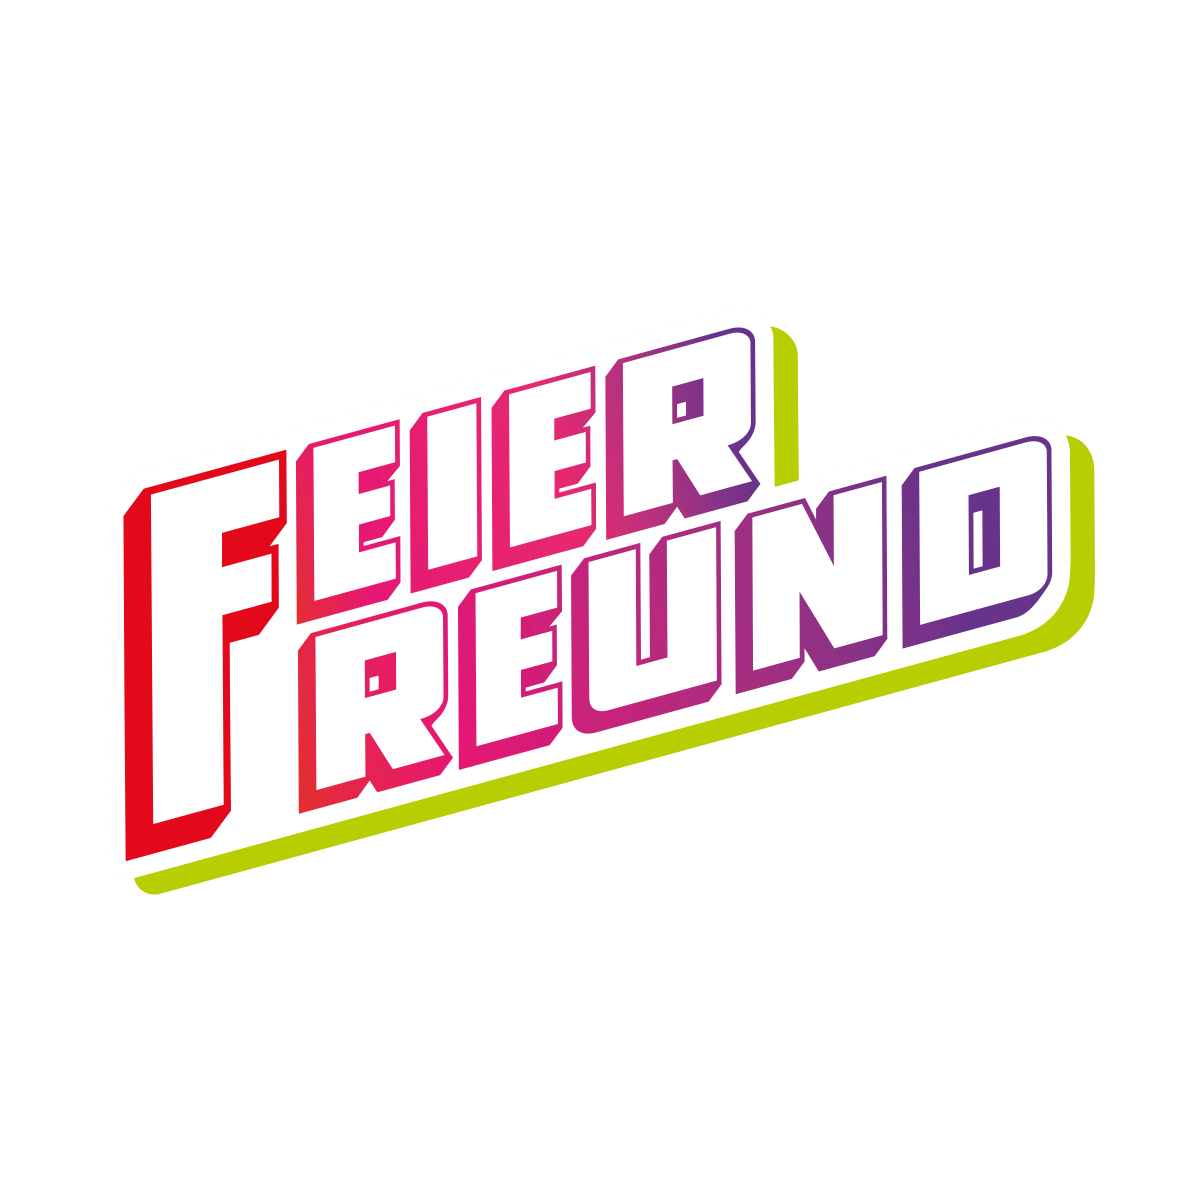 Feierfreund